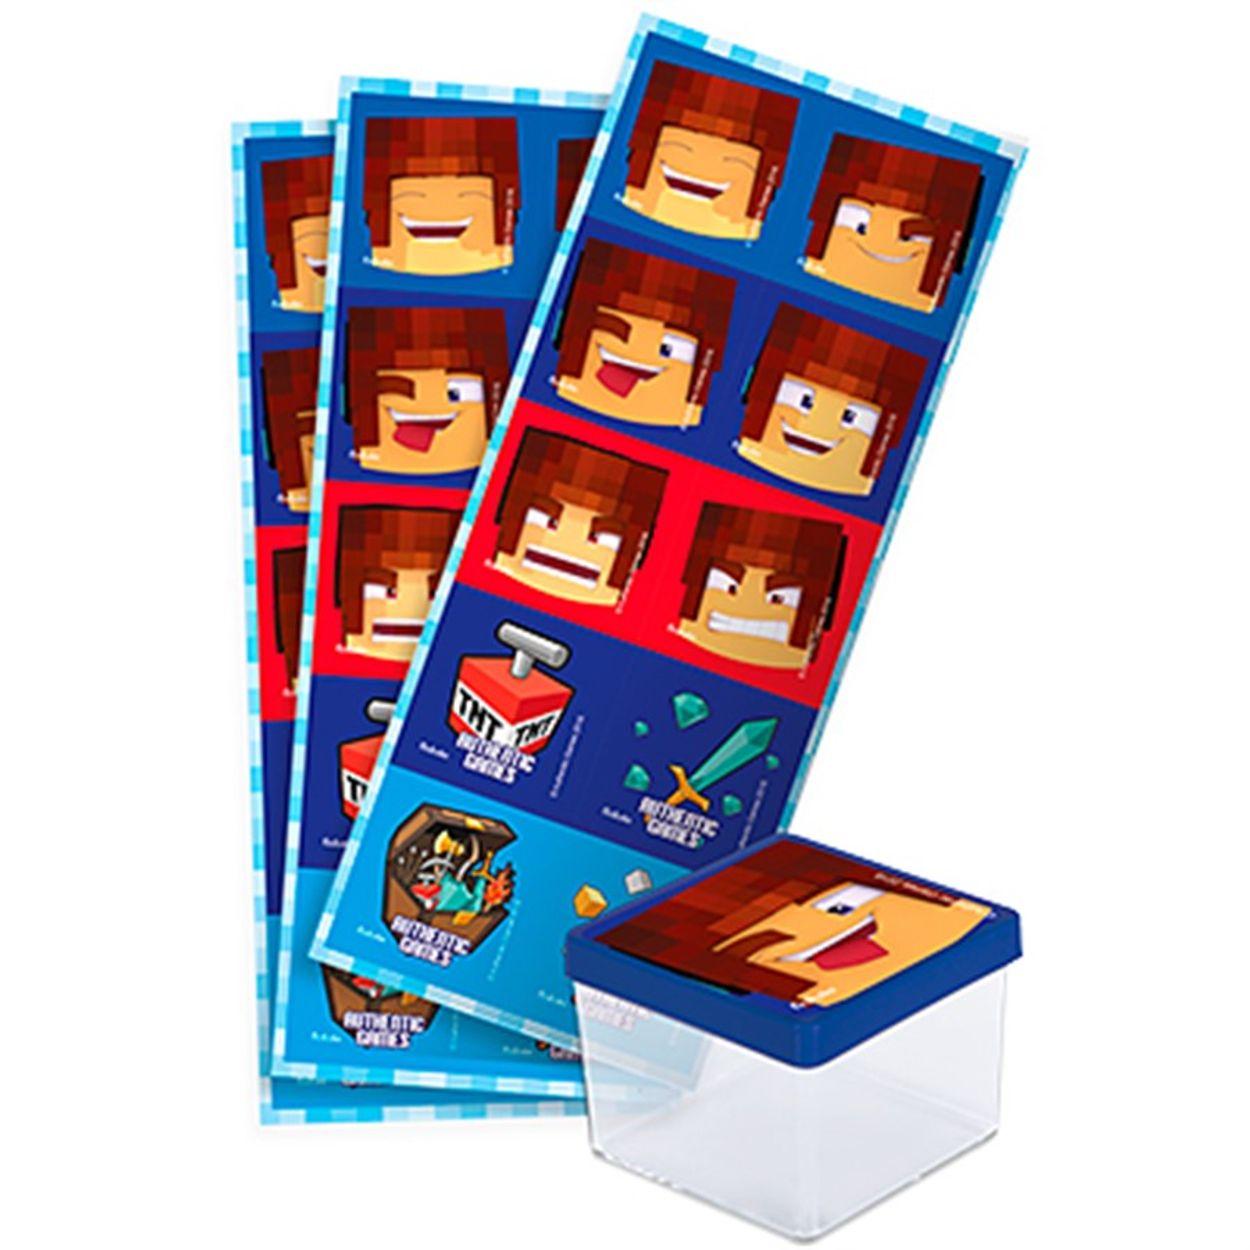 Adesivo quadrado Authentic Games-30 Unidades